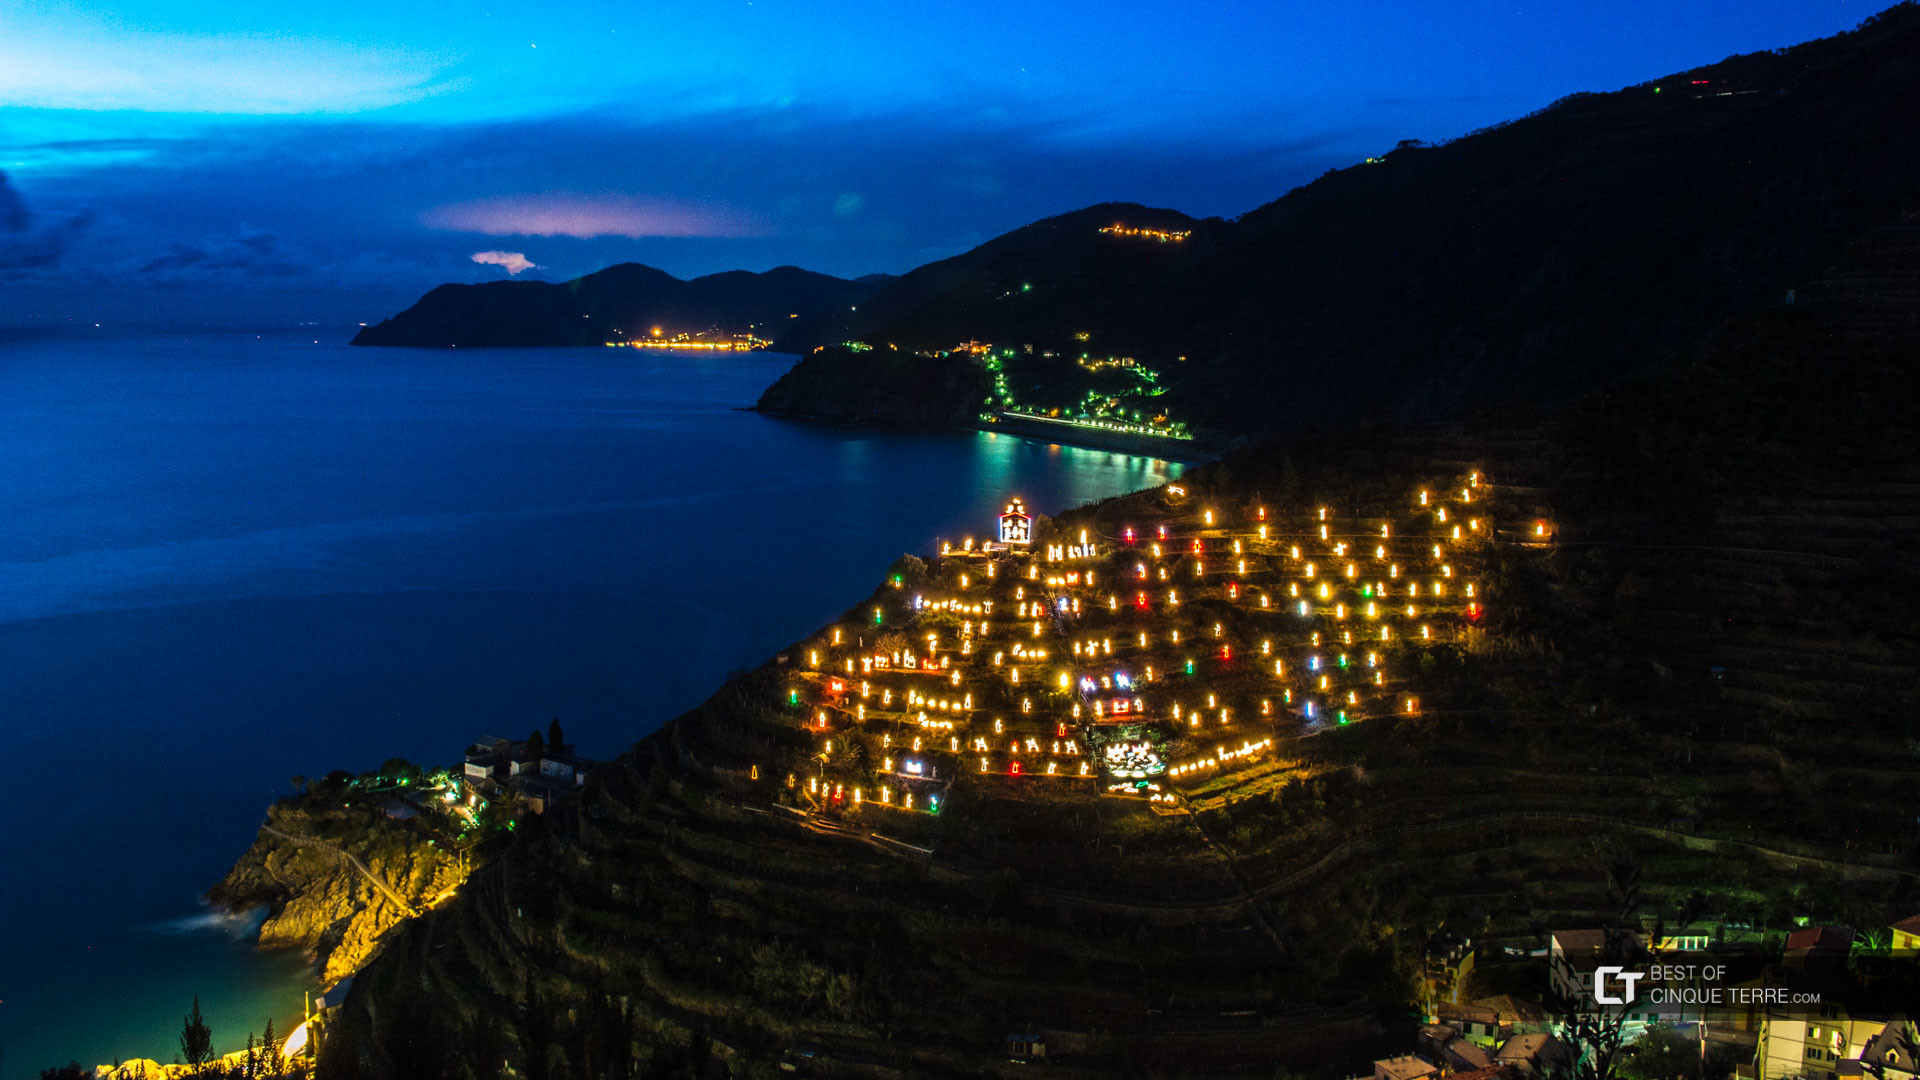 Christmas nativity scene (Presepe), Manarola, Cinque Terre, Italy